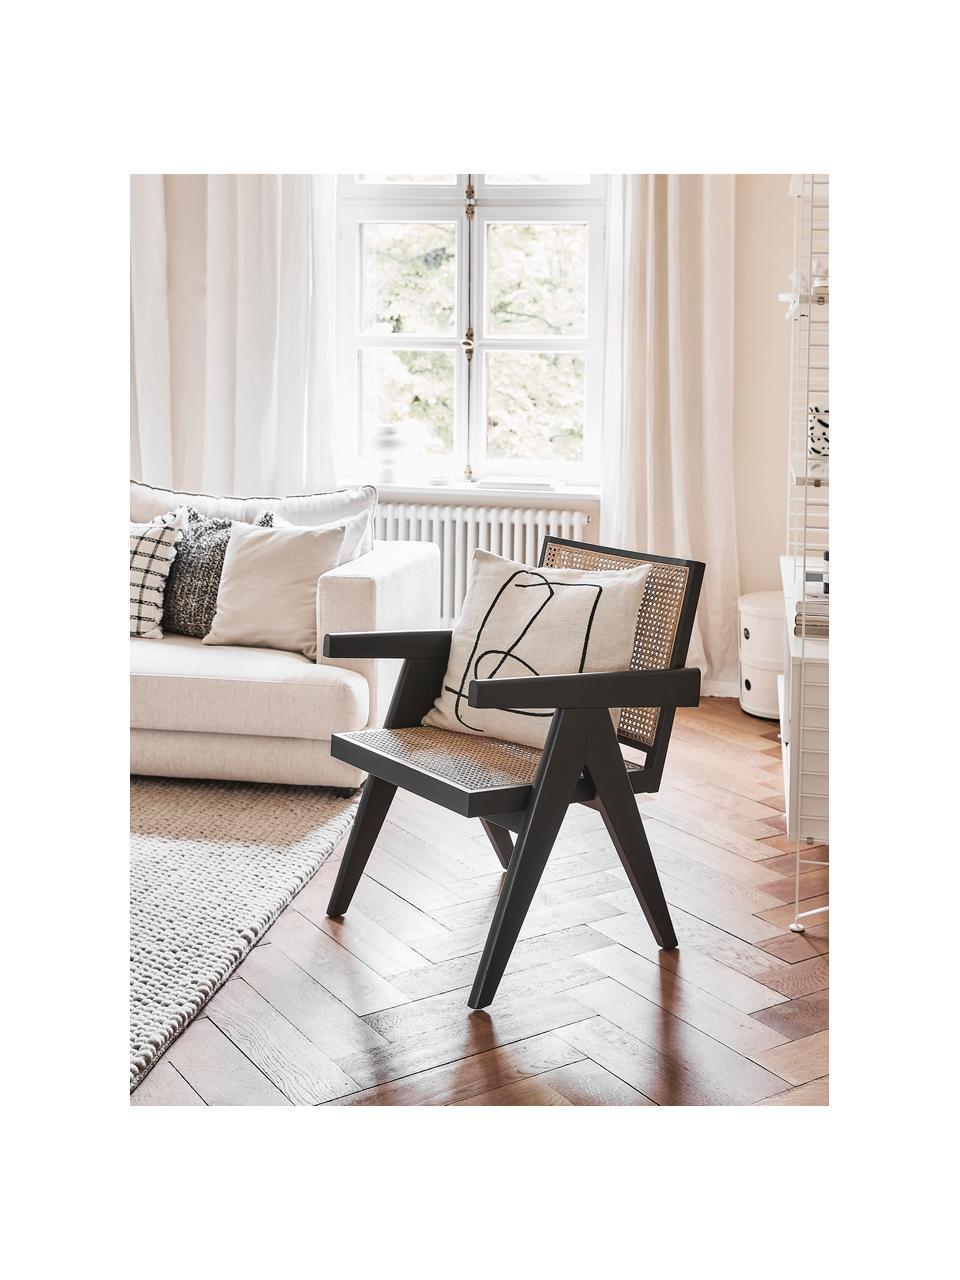 Loungefauteuil Sissi met Weens vlechtwerk, Frame: massief gelakt beukenhout, Zitvlak: rotan, Beukenhout, B 58 x D 66 cm